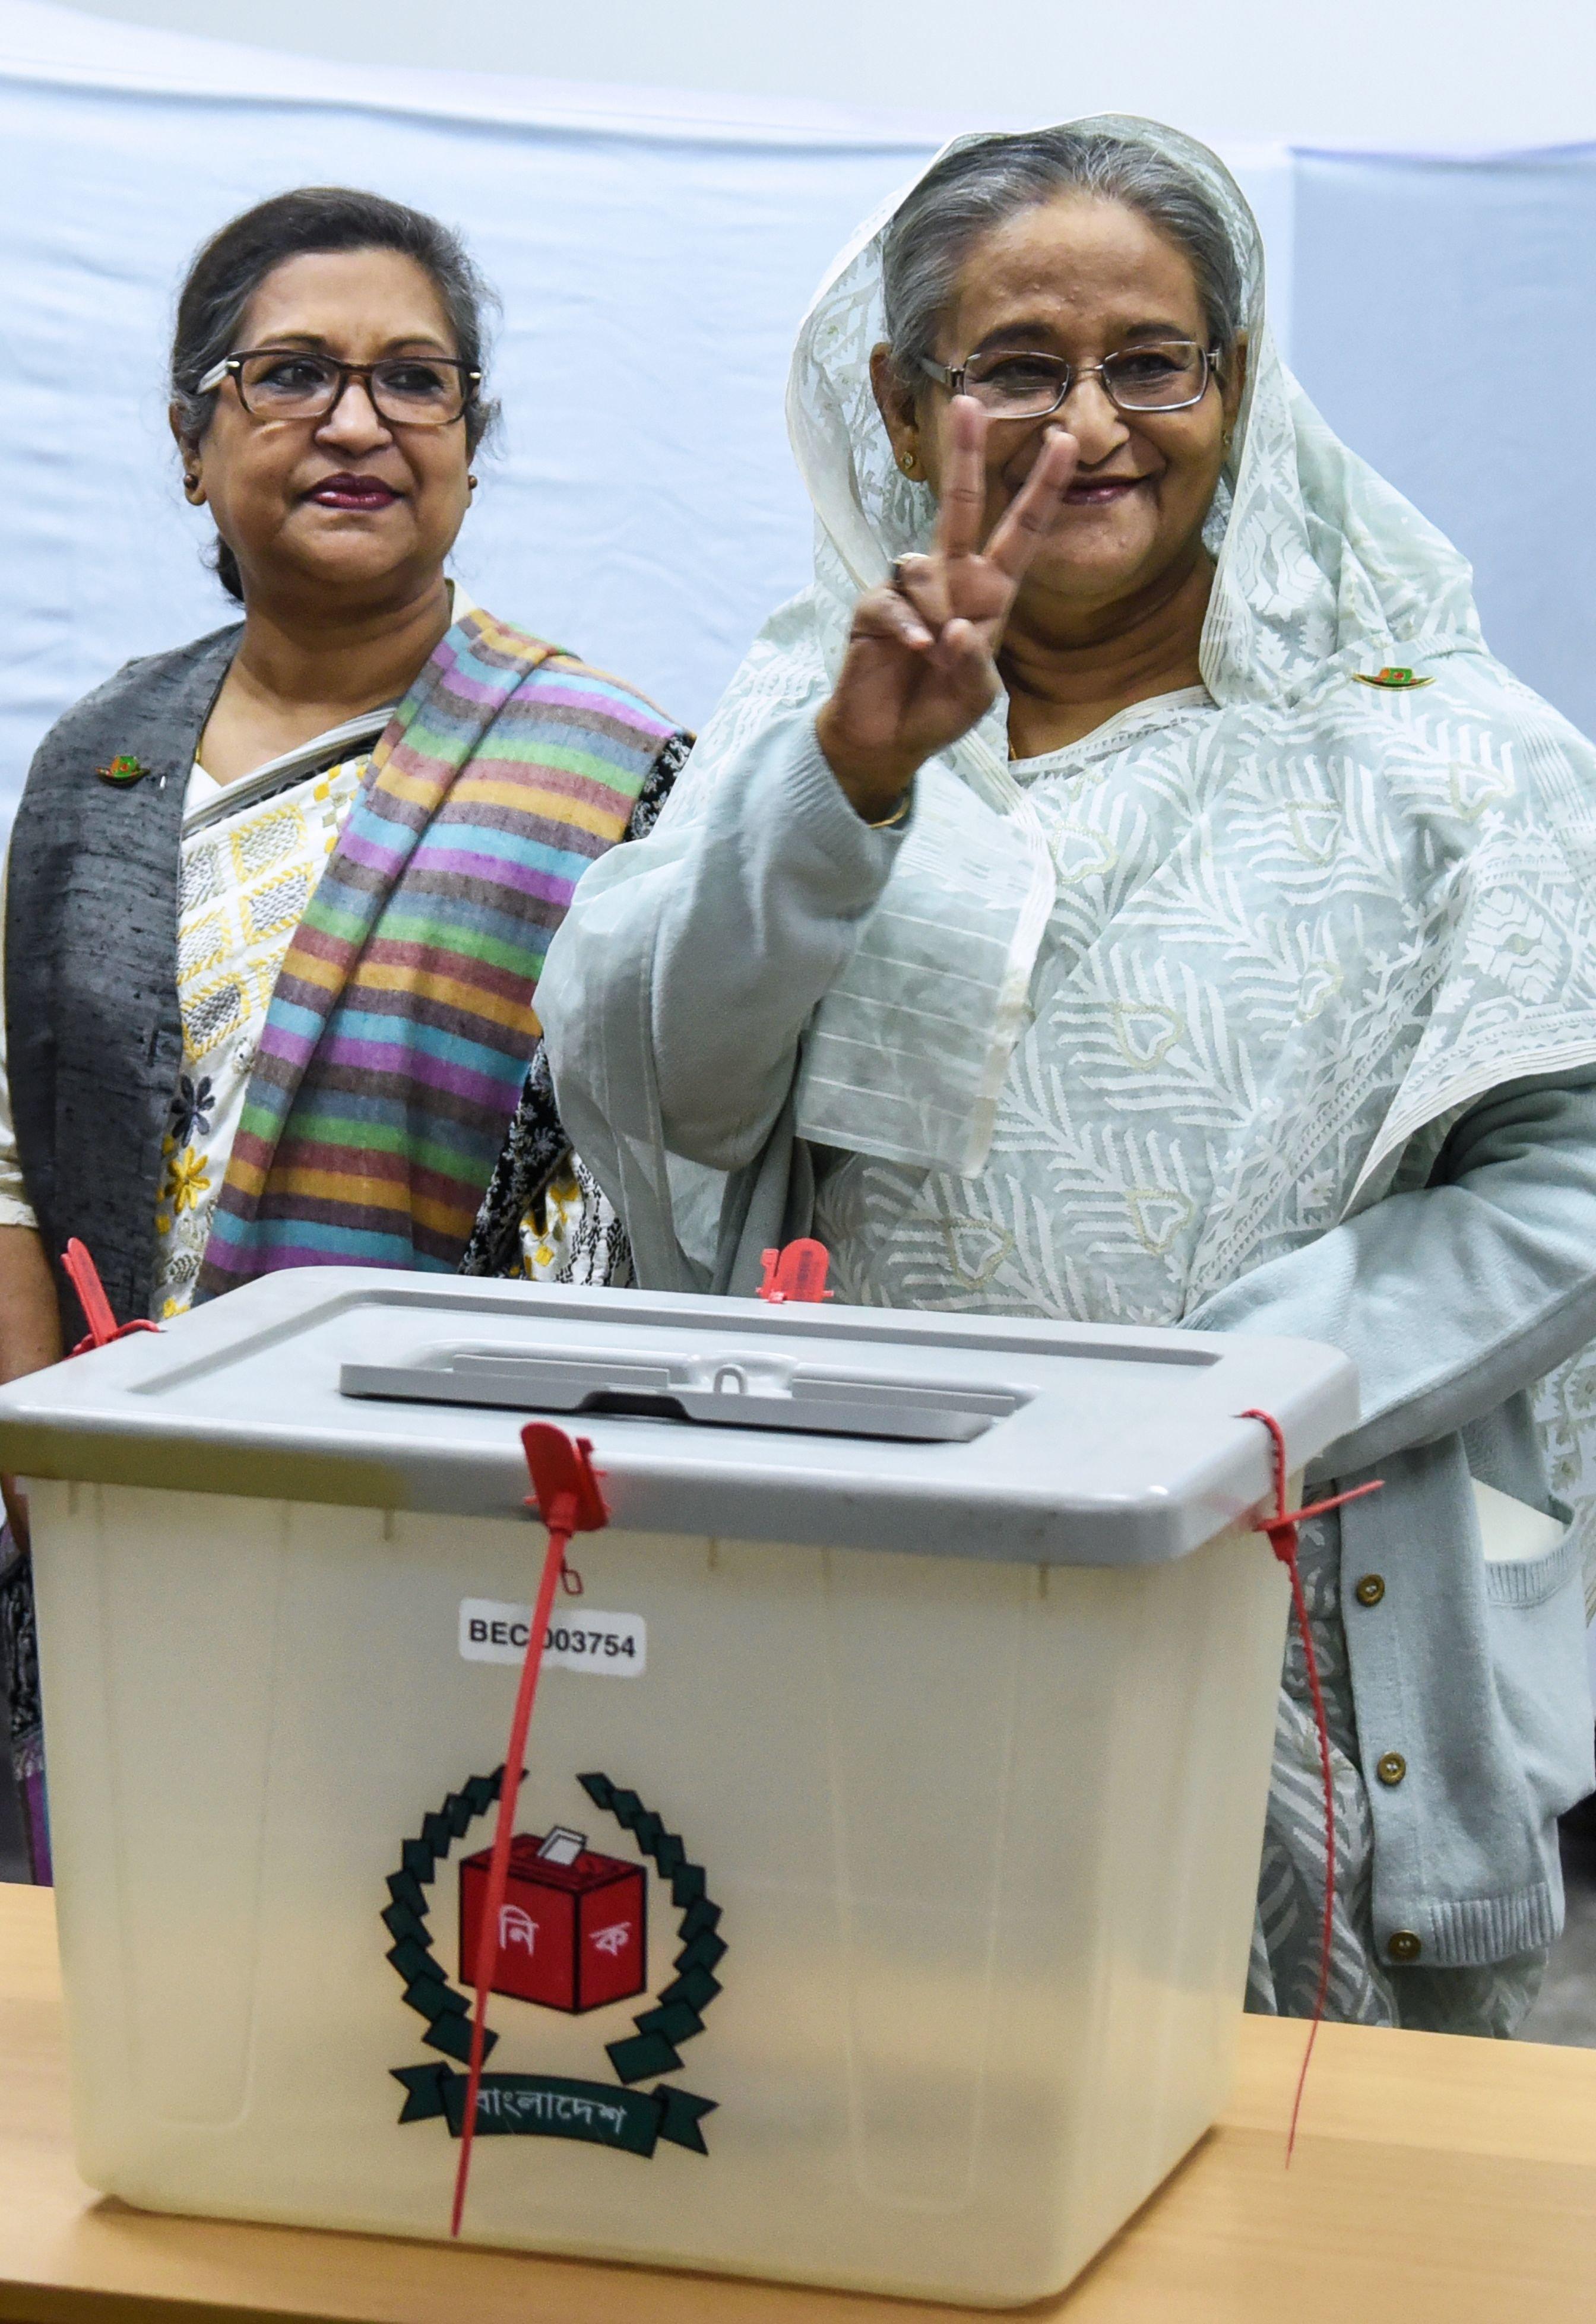 Bangladesh Elections: Sheikh Hasina's Alliance Wins Thumping